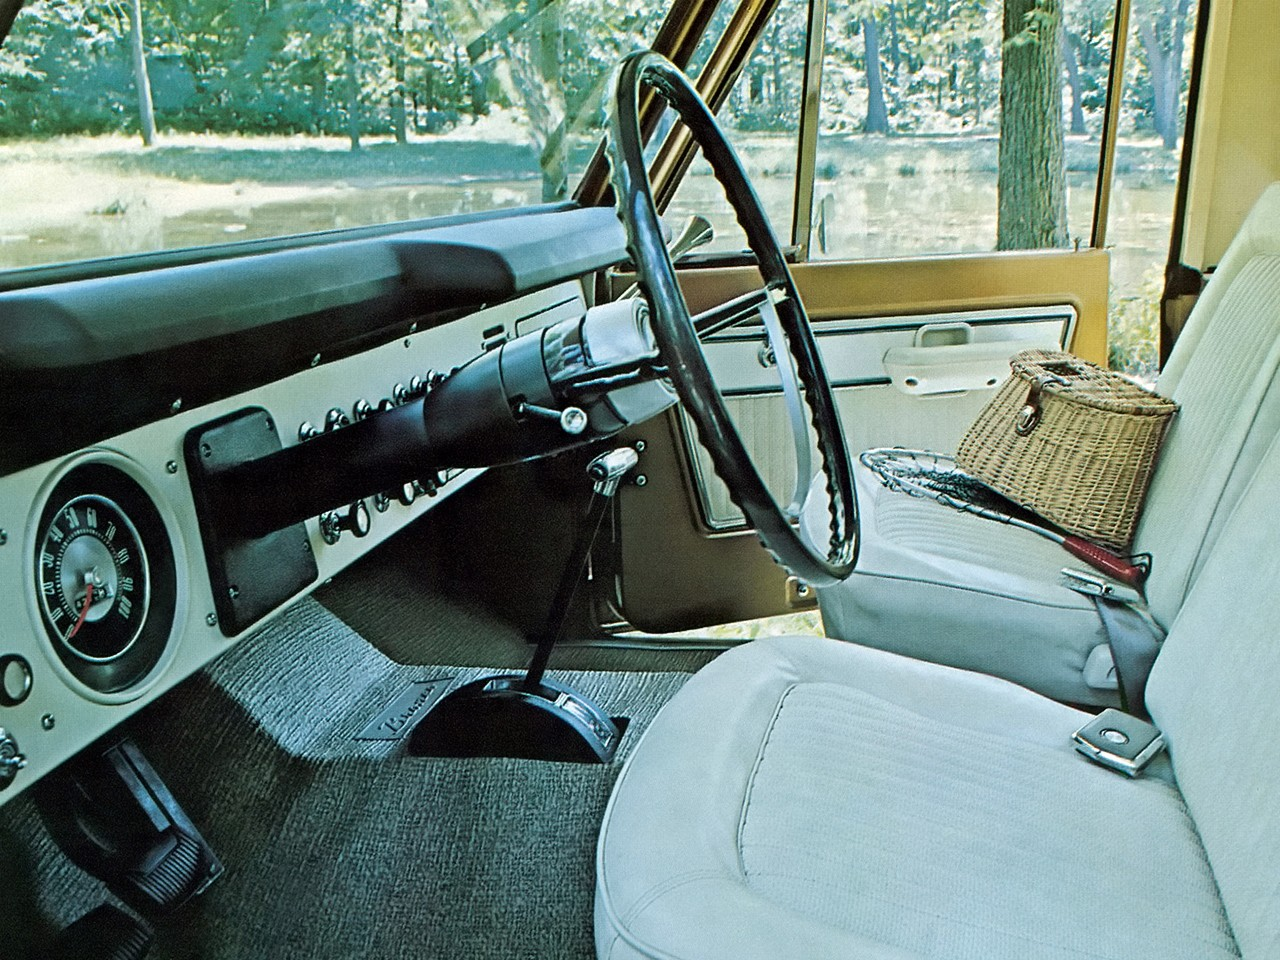 Ford Bronco Specs Photos 1966 1967 1968 1969 1970 1971 Interior 1977